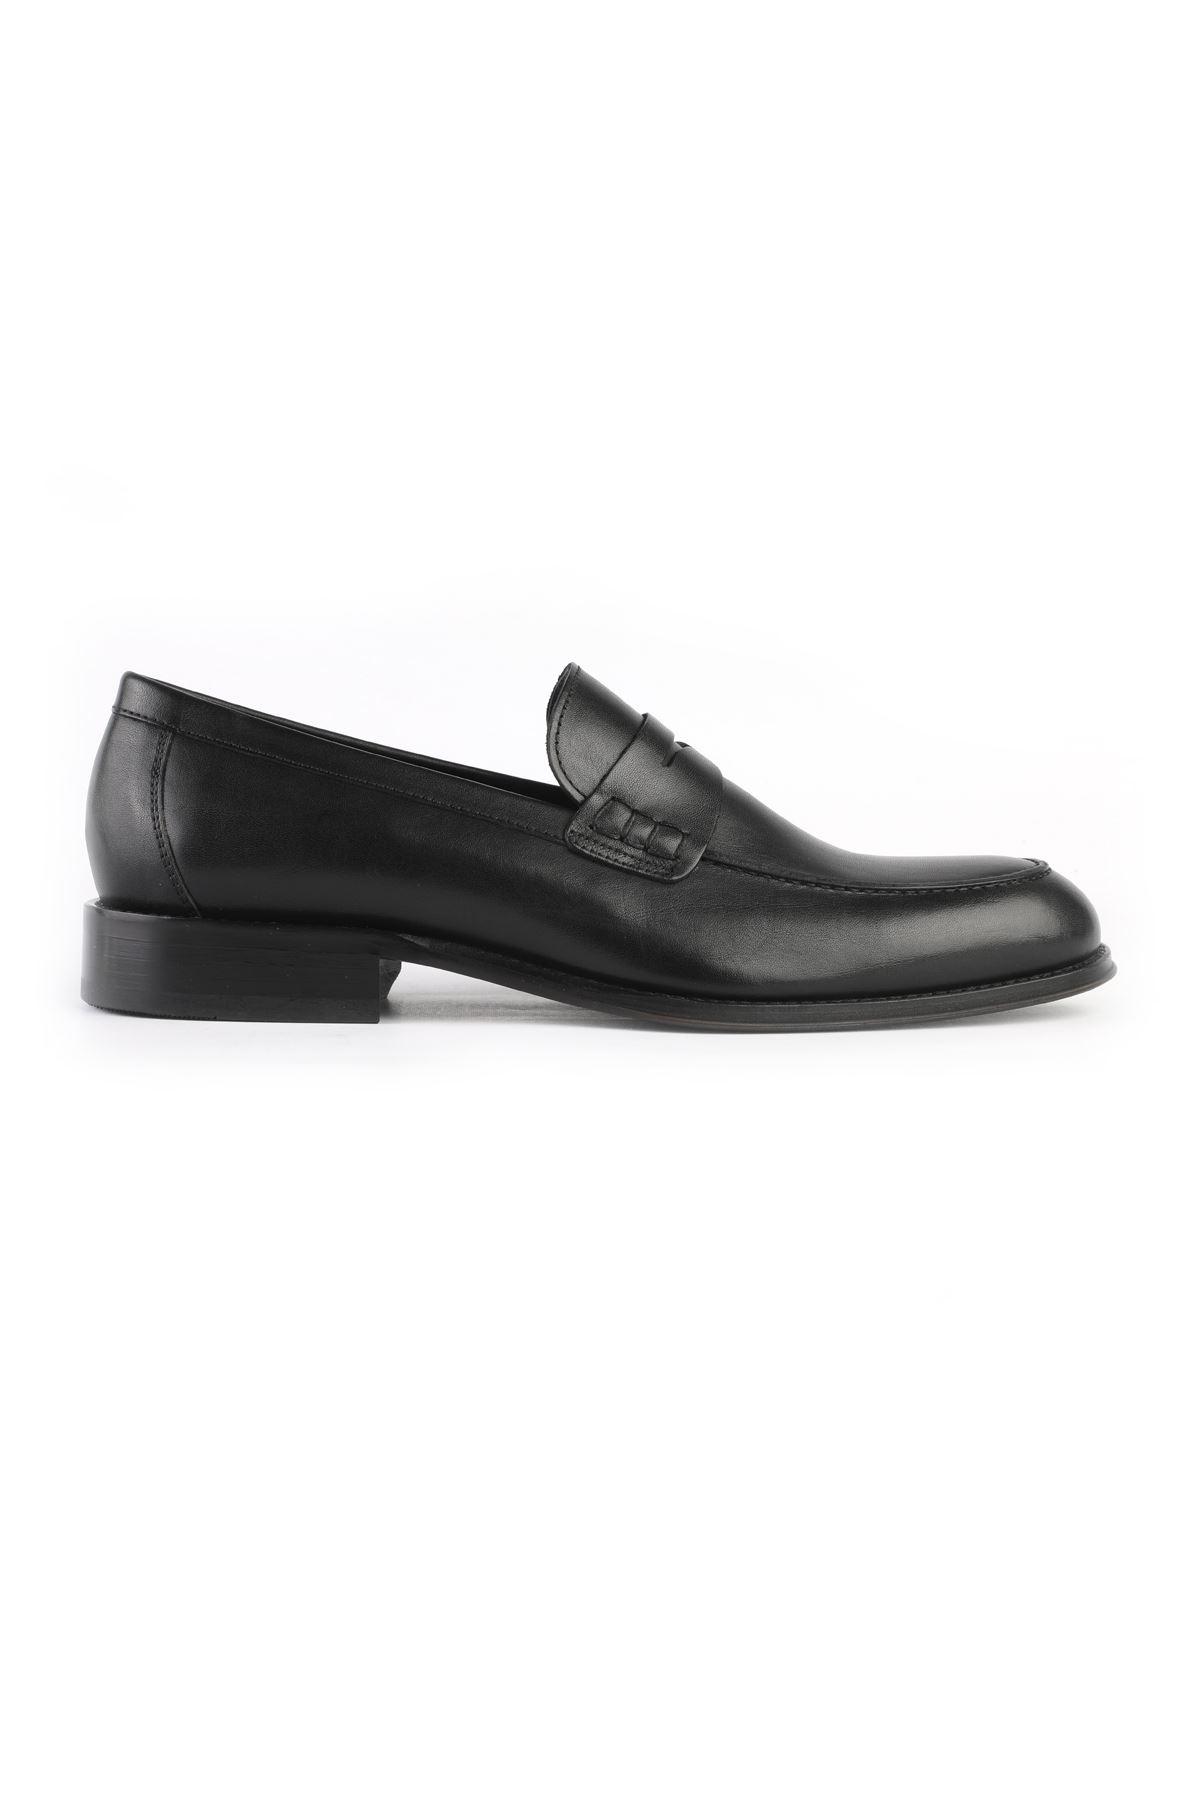 Libero 2402 Black Loafer Shoes